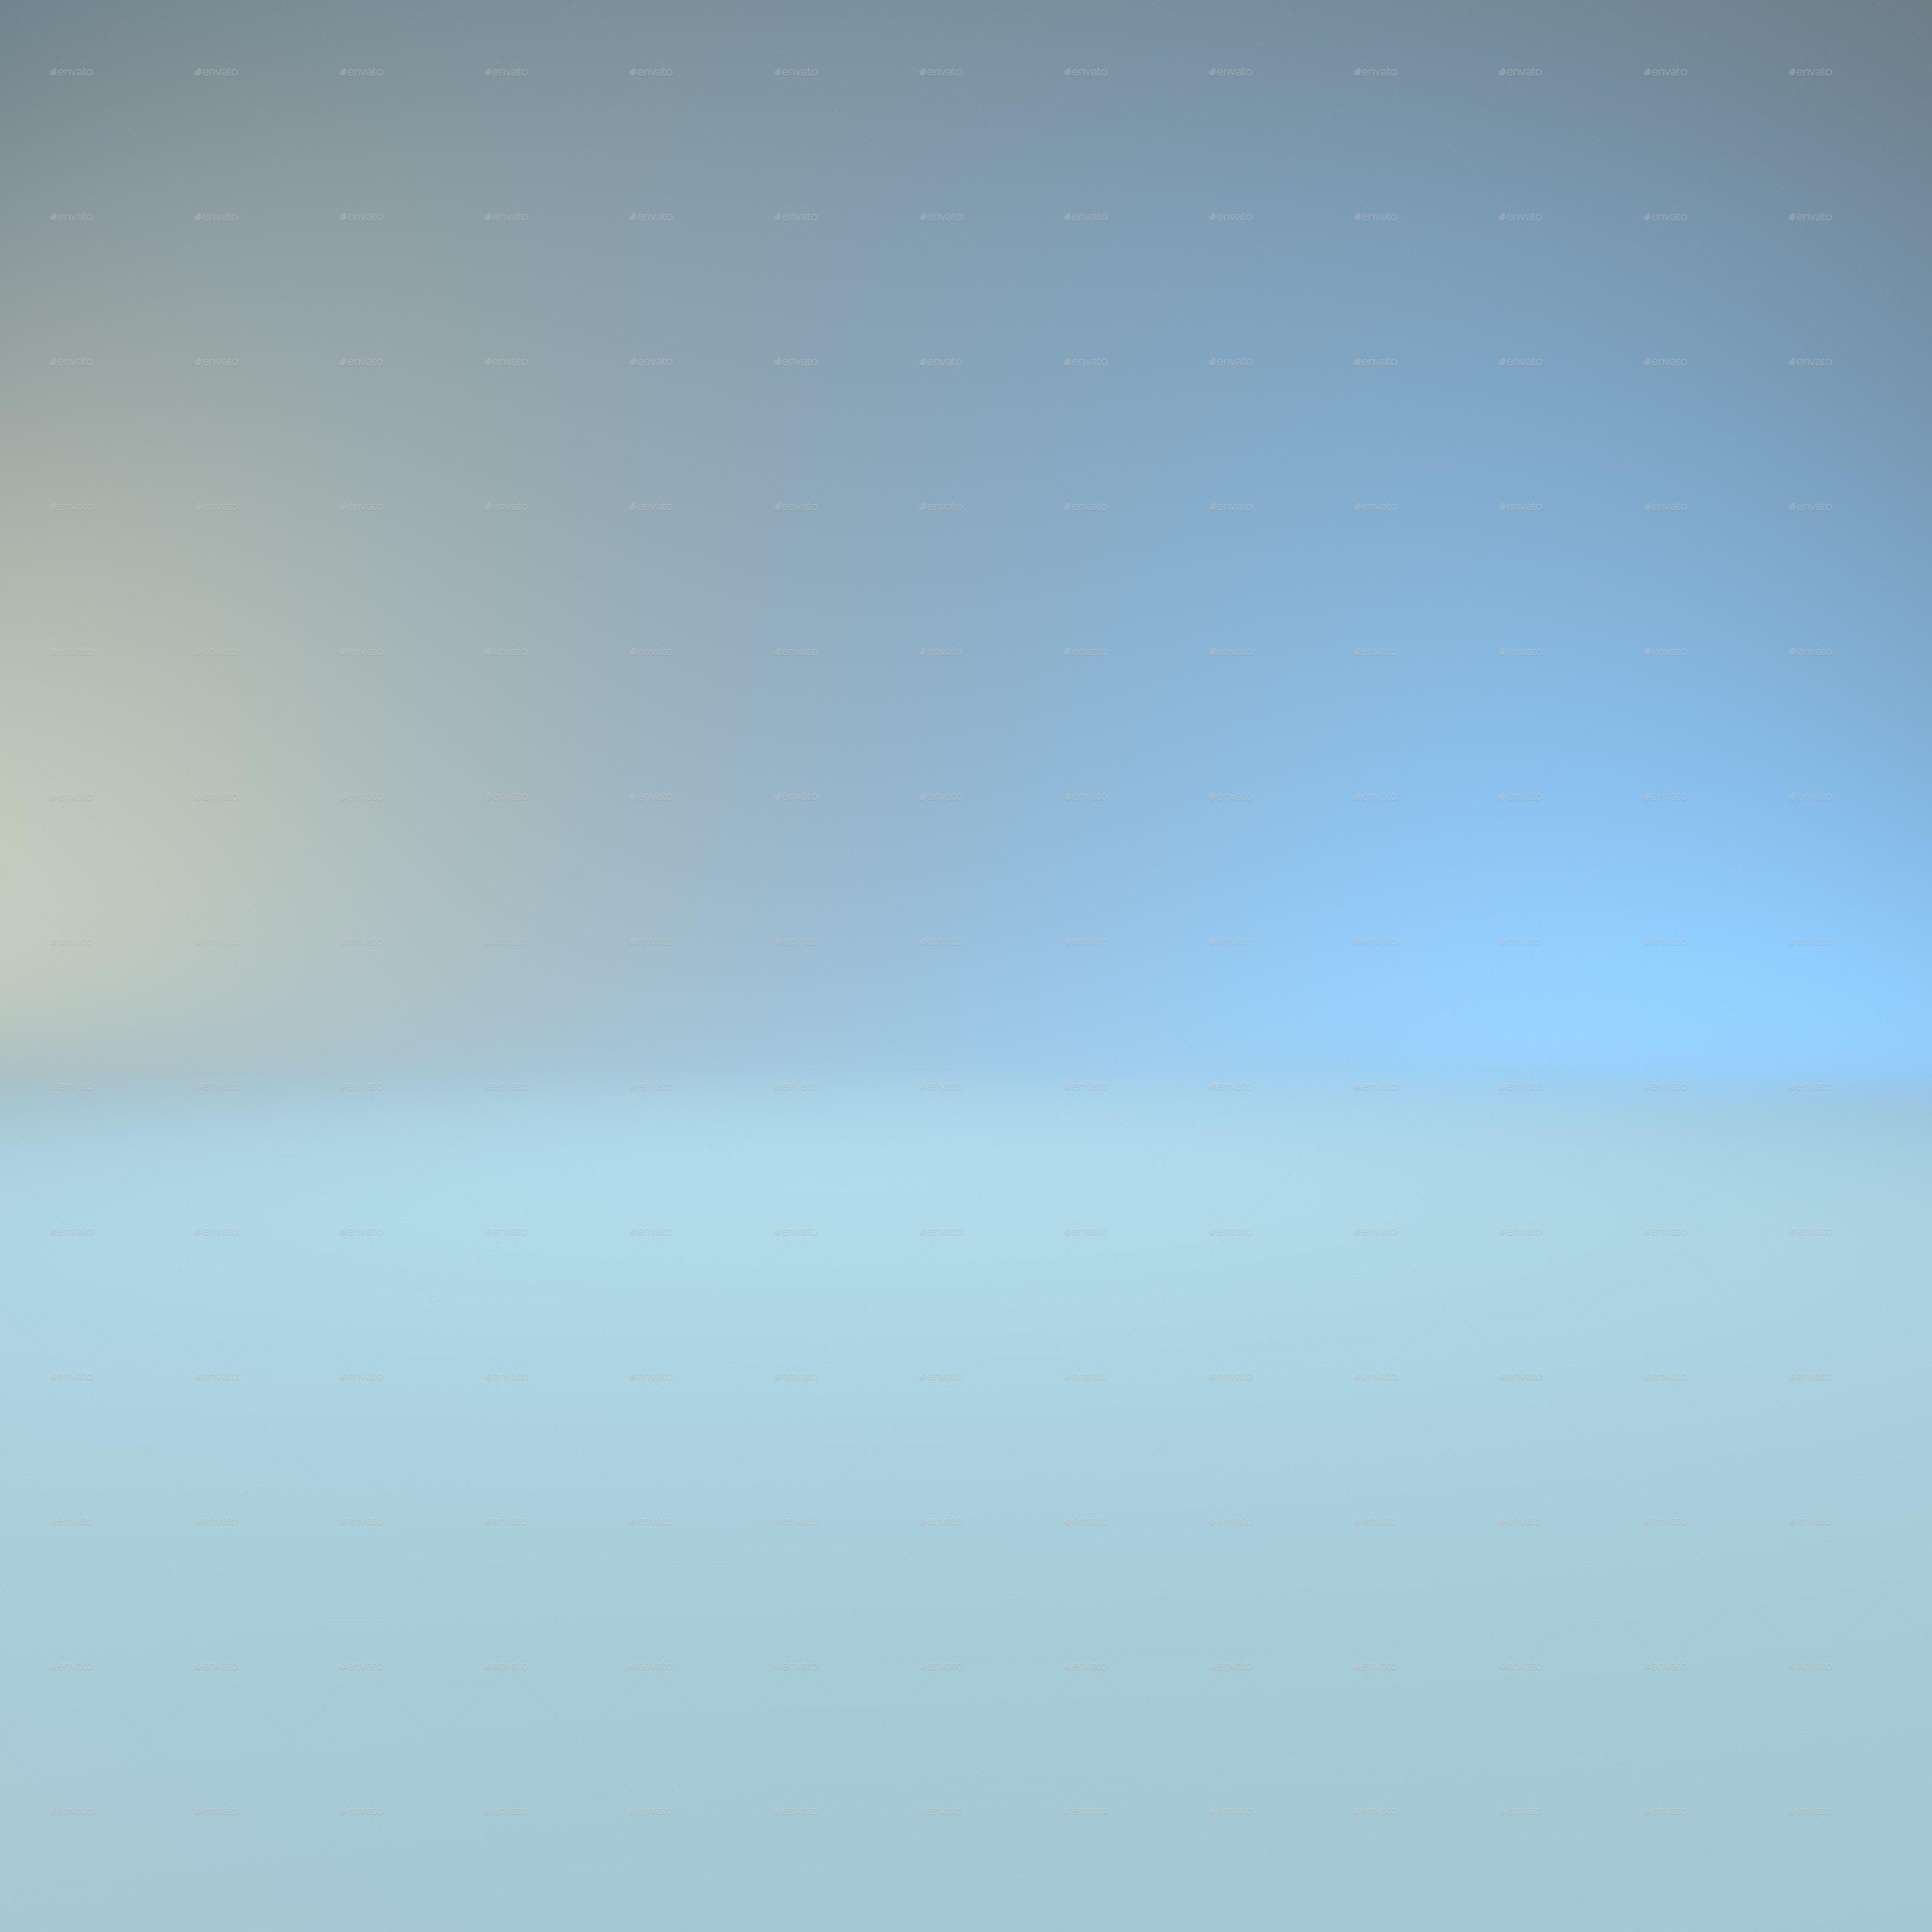 Infinite Studio with Light Set up Preppy wallpaper